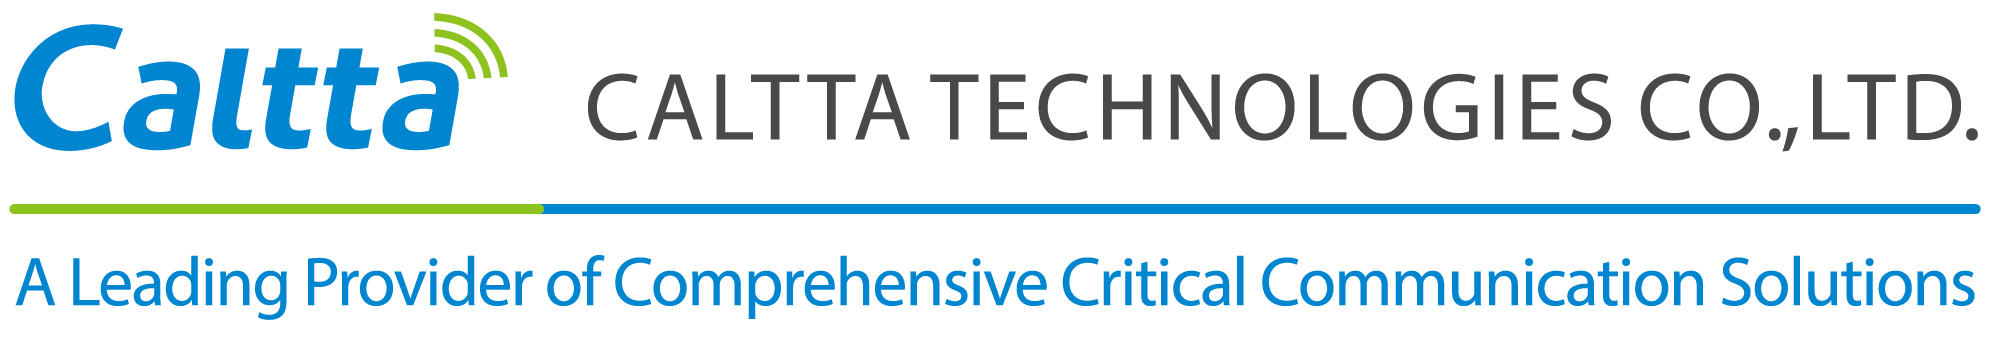 Caltta Technologies Co., Ltd logo